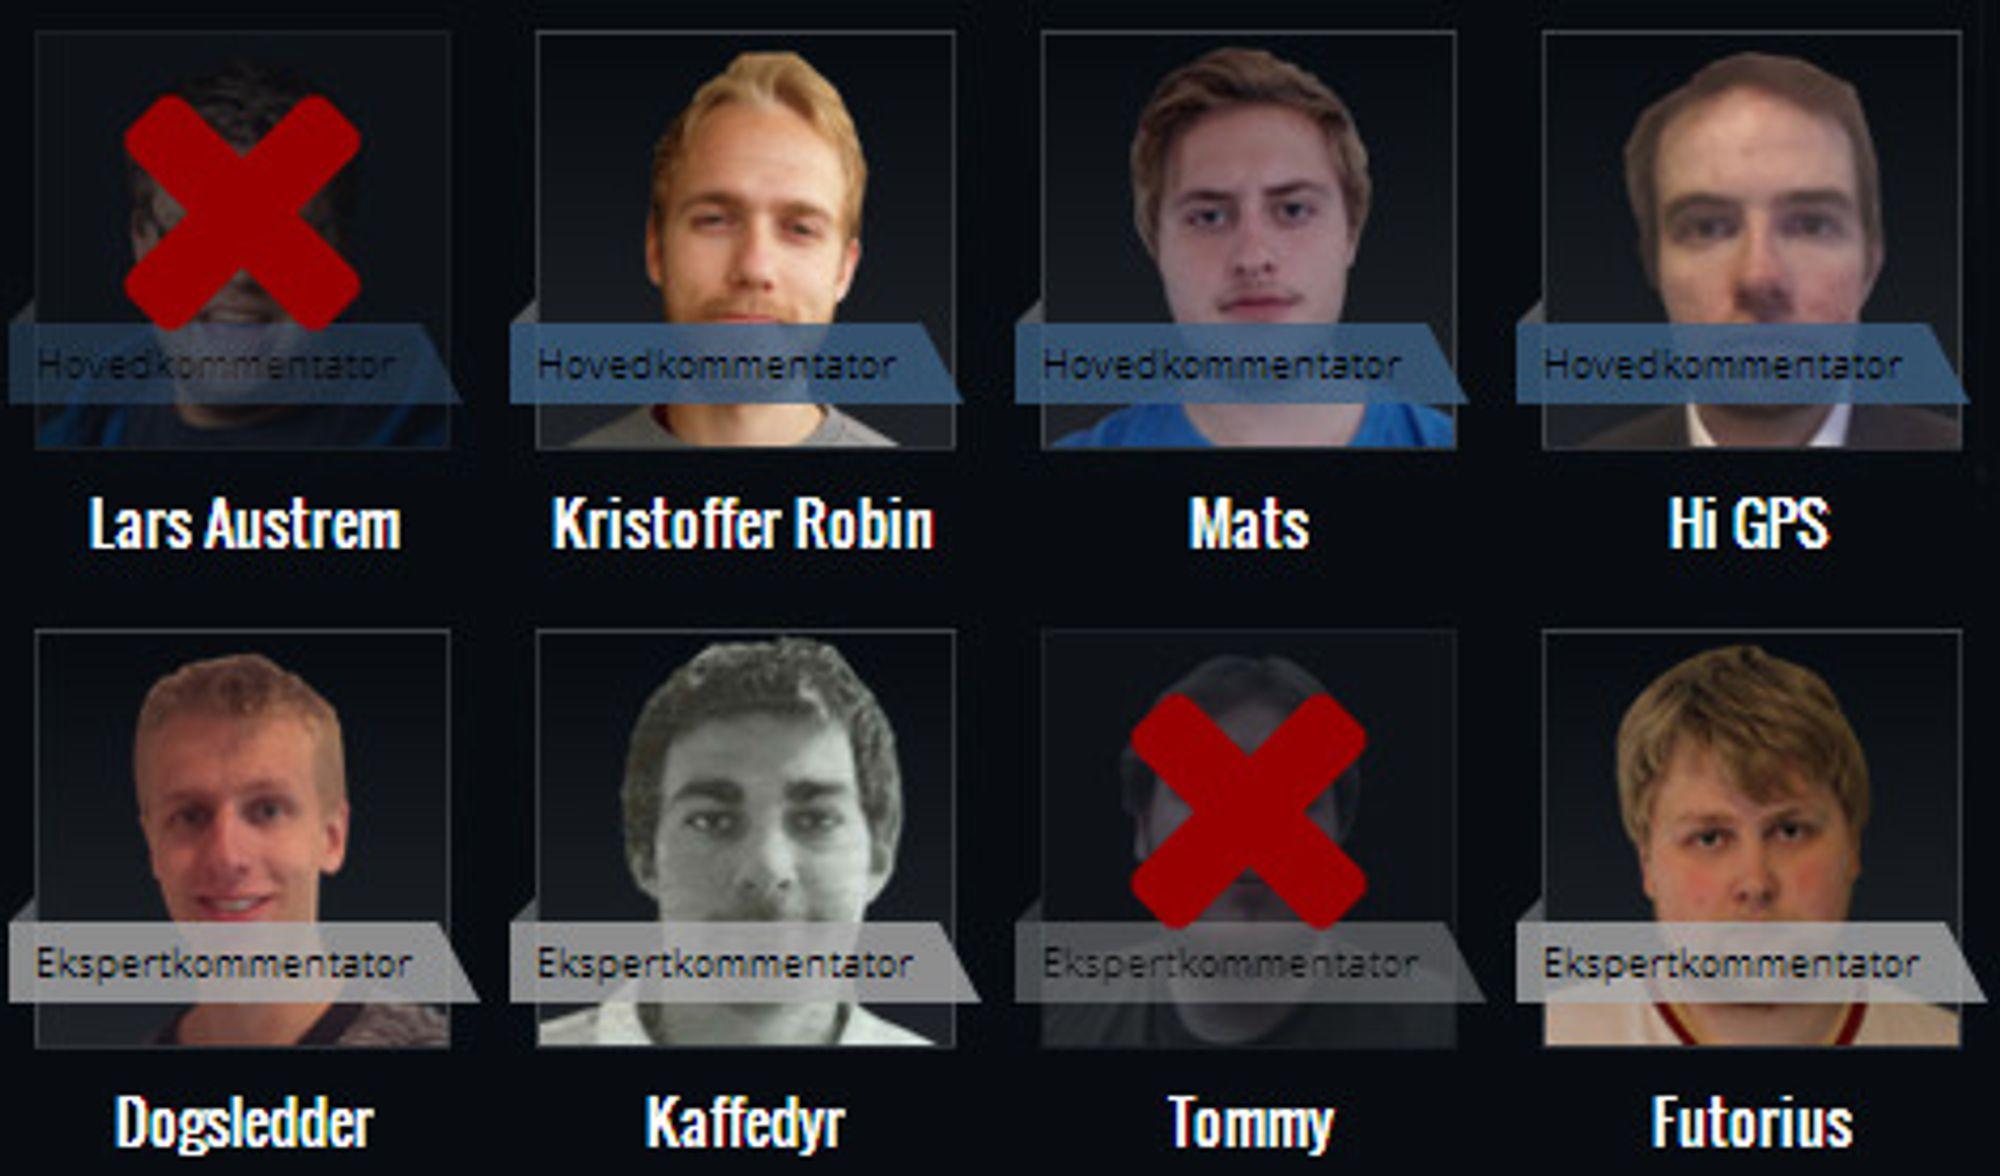 Dette er StarCraft-kommentatorene som deltar i konkurransen.